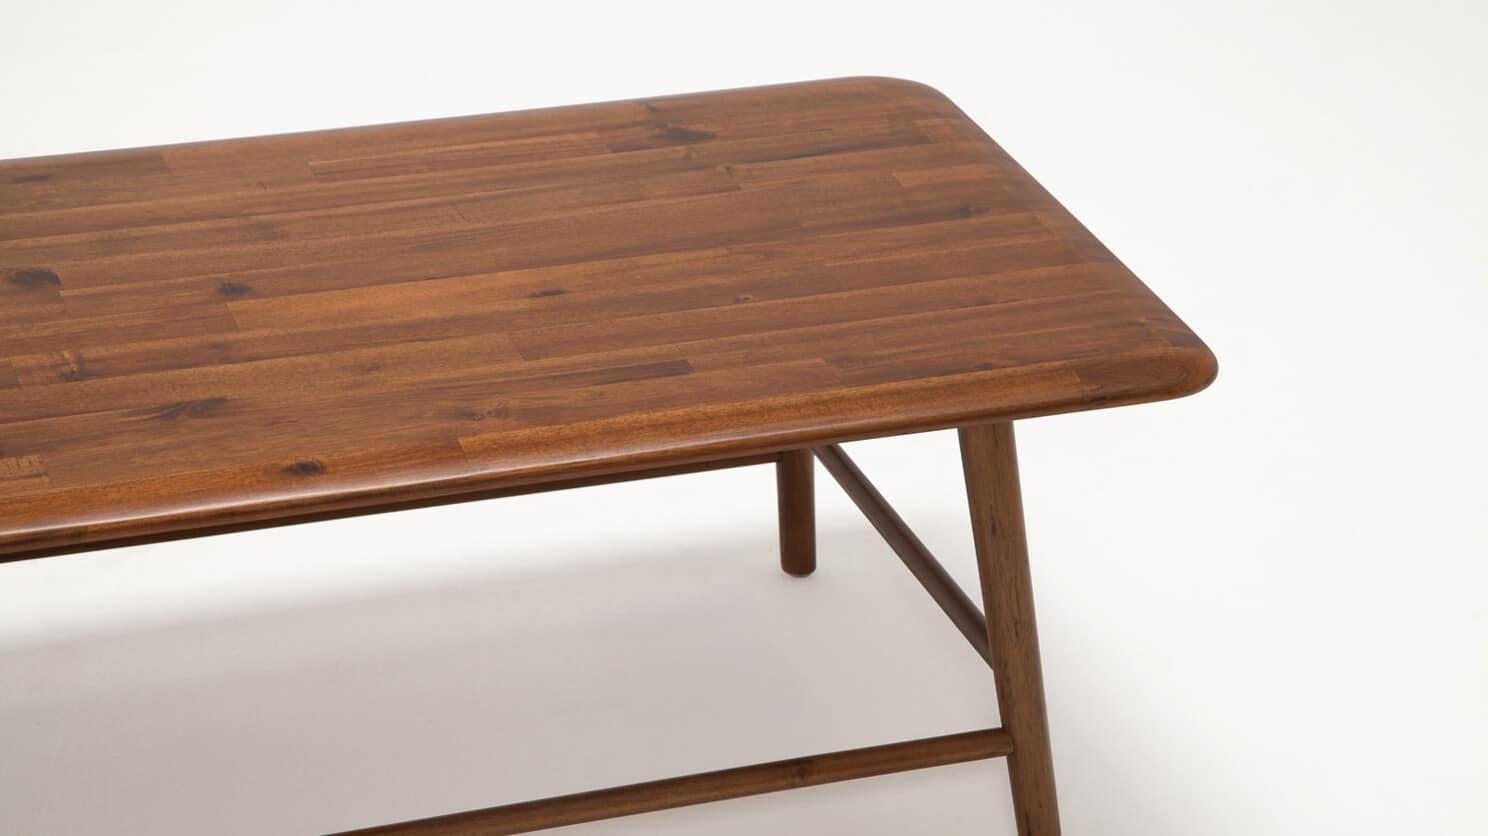 7110 032 49 4 coffee tables kacia rectangular coffee table detail 01